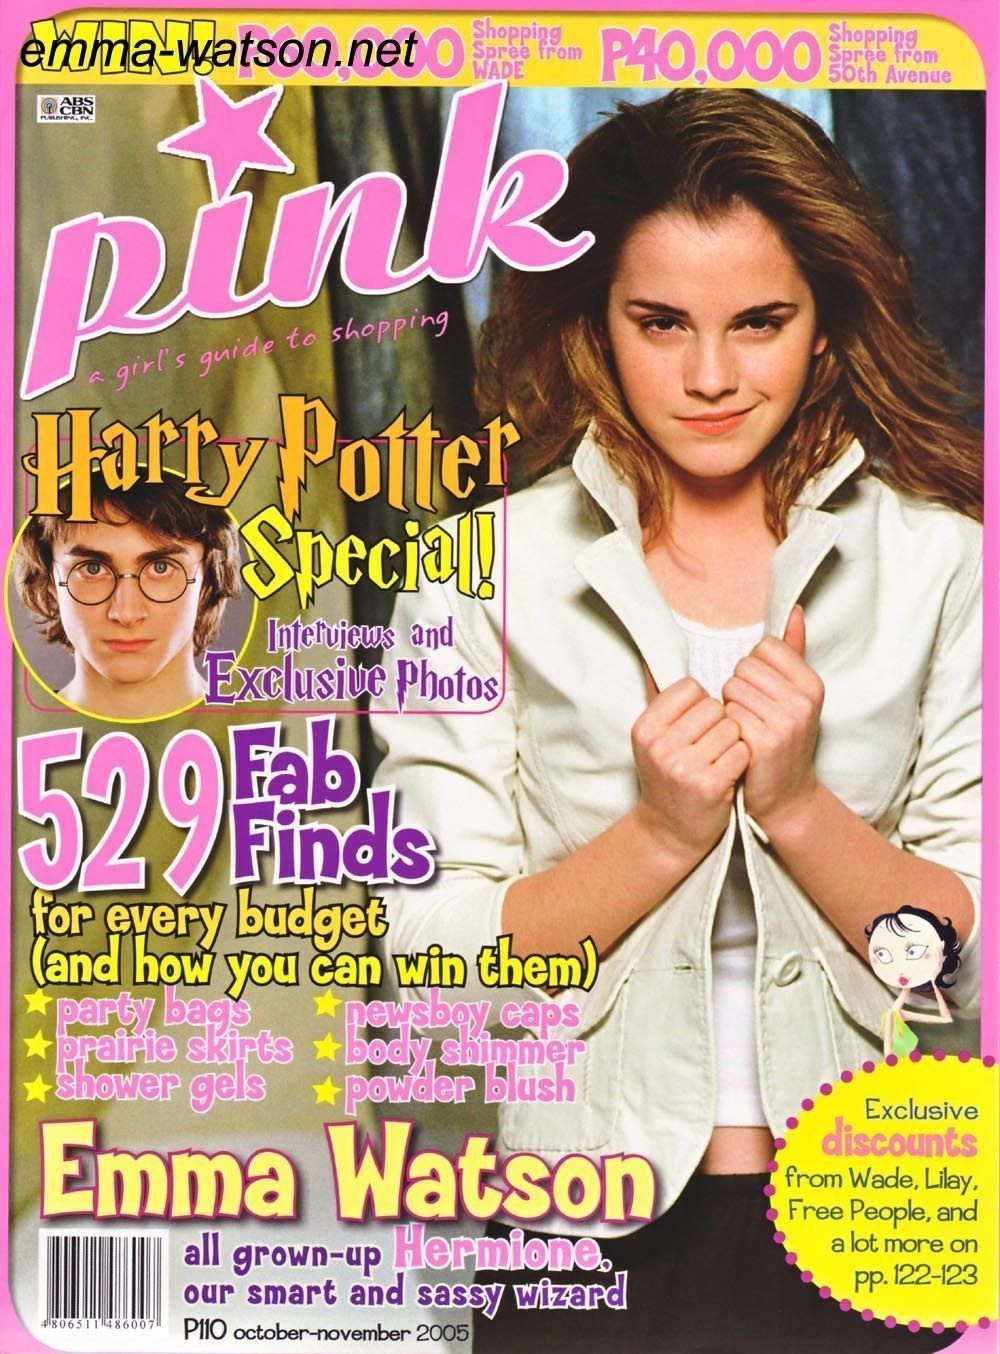 Emmawatson Pink Magazine October 2005 Instagram Https Www Instagram Com We Love Emma Watson Crush Passate Dal Nostro Gruppo Https Www Facebook